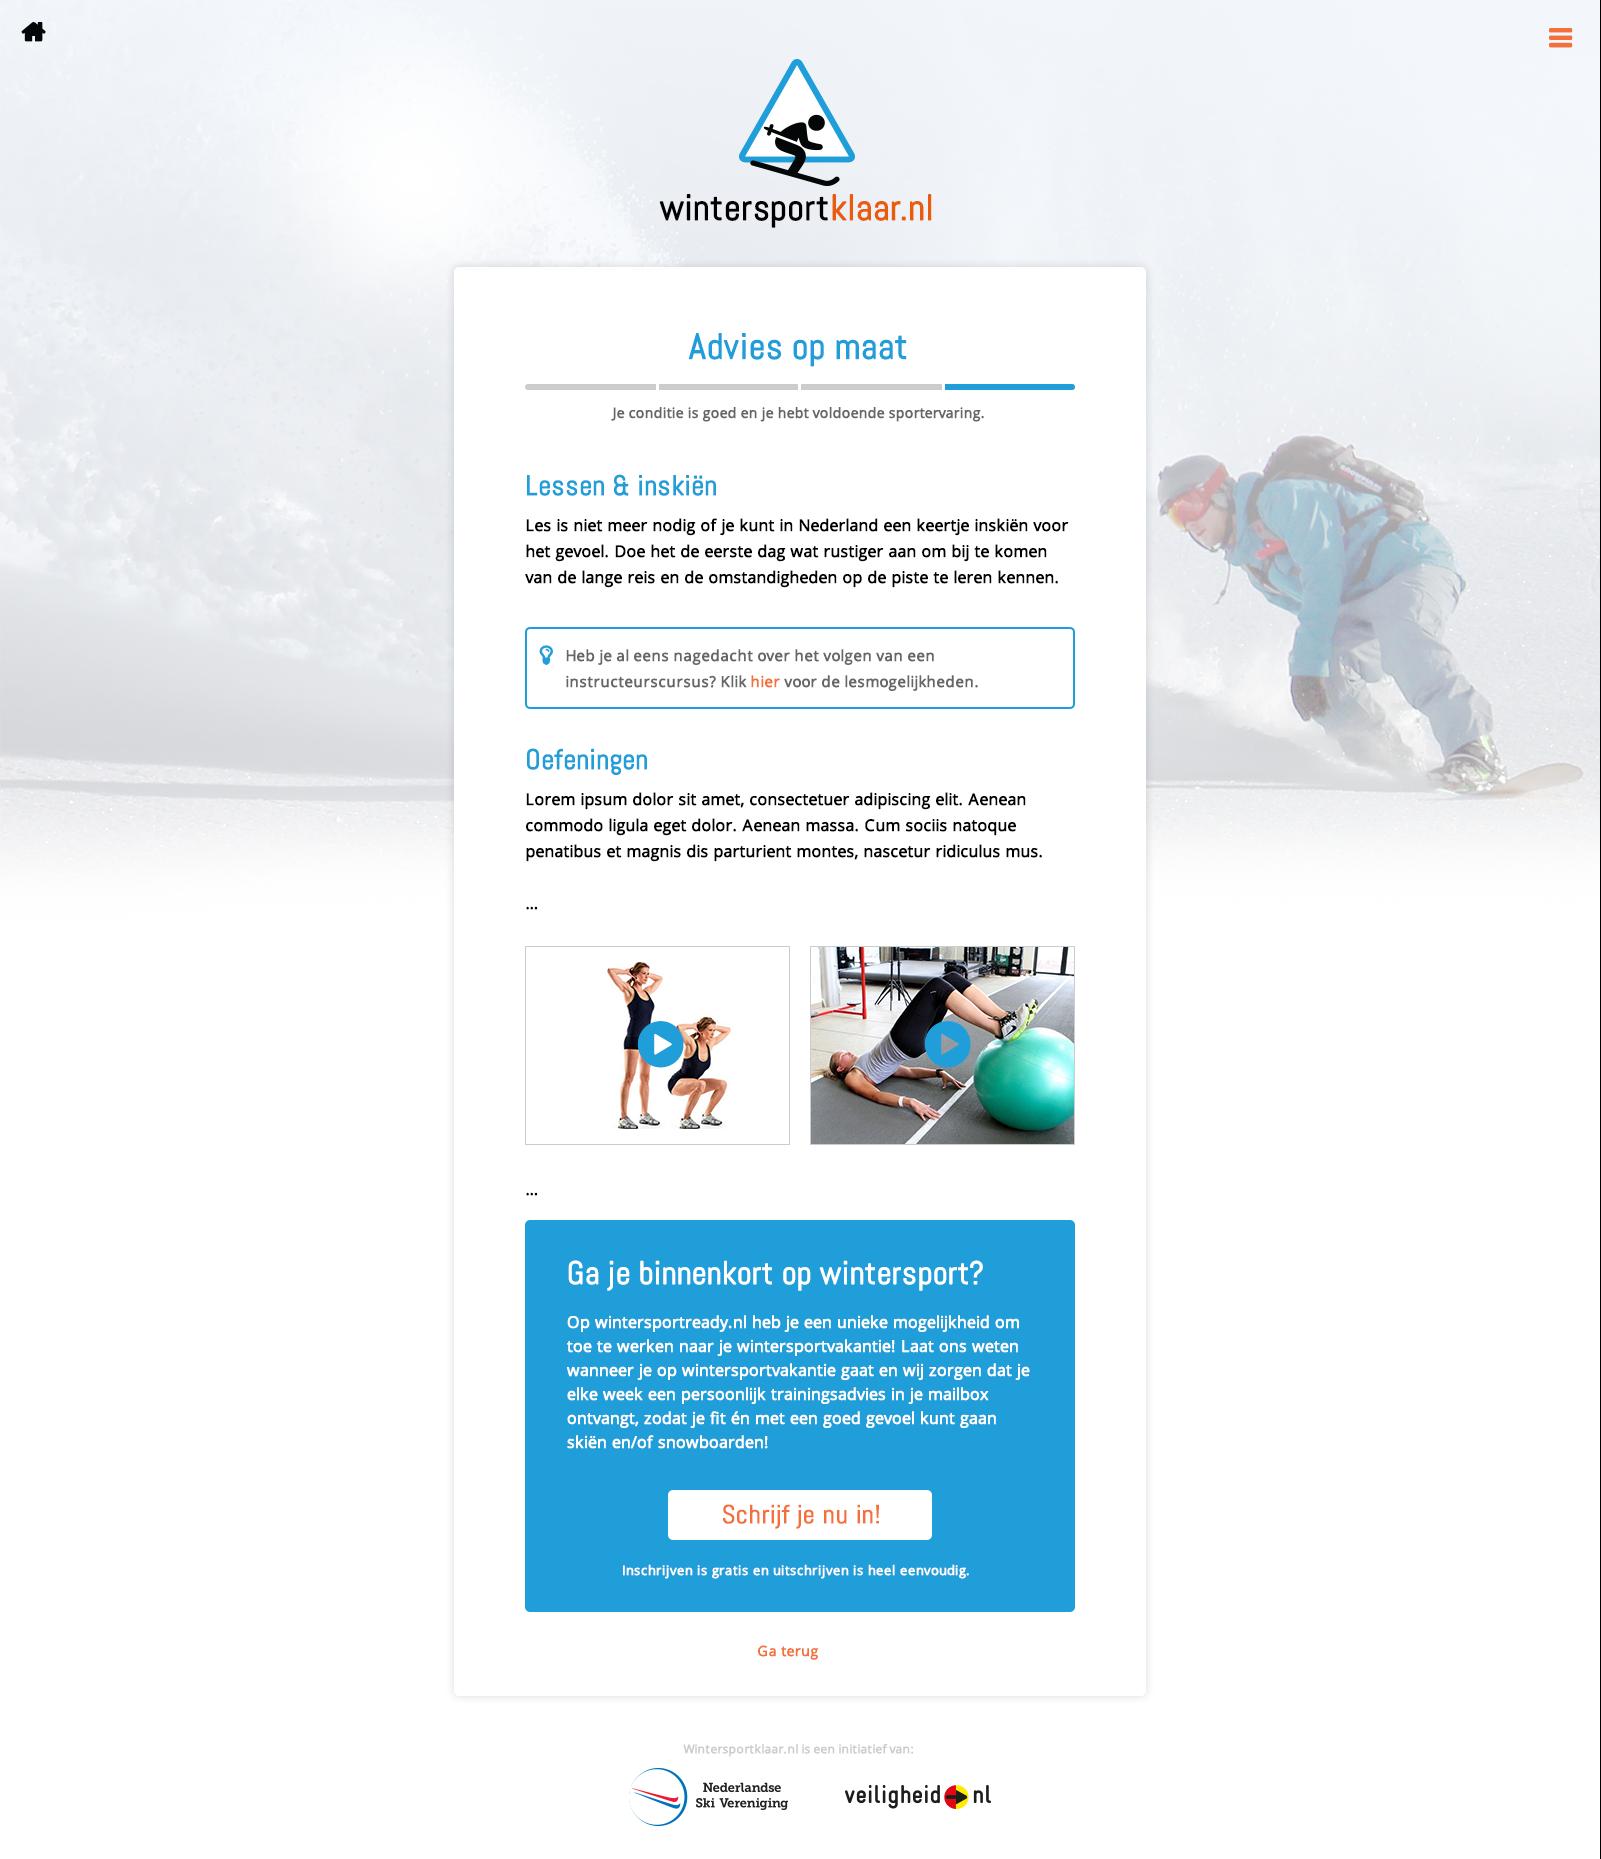 ski-6-e1488892508752.png